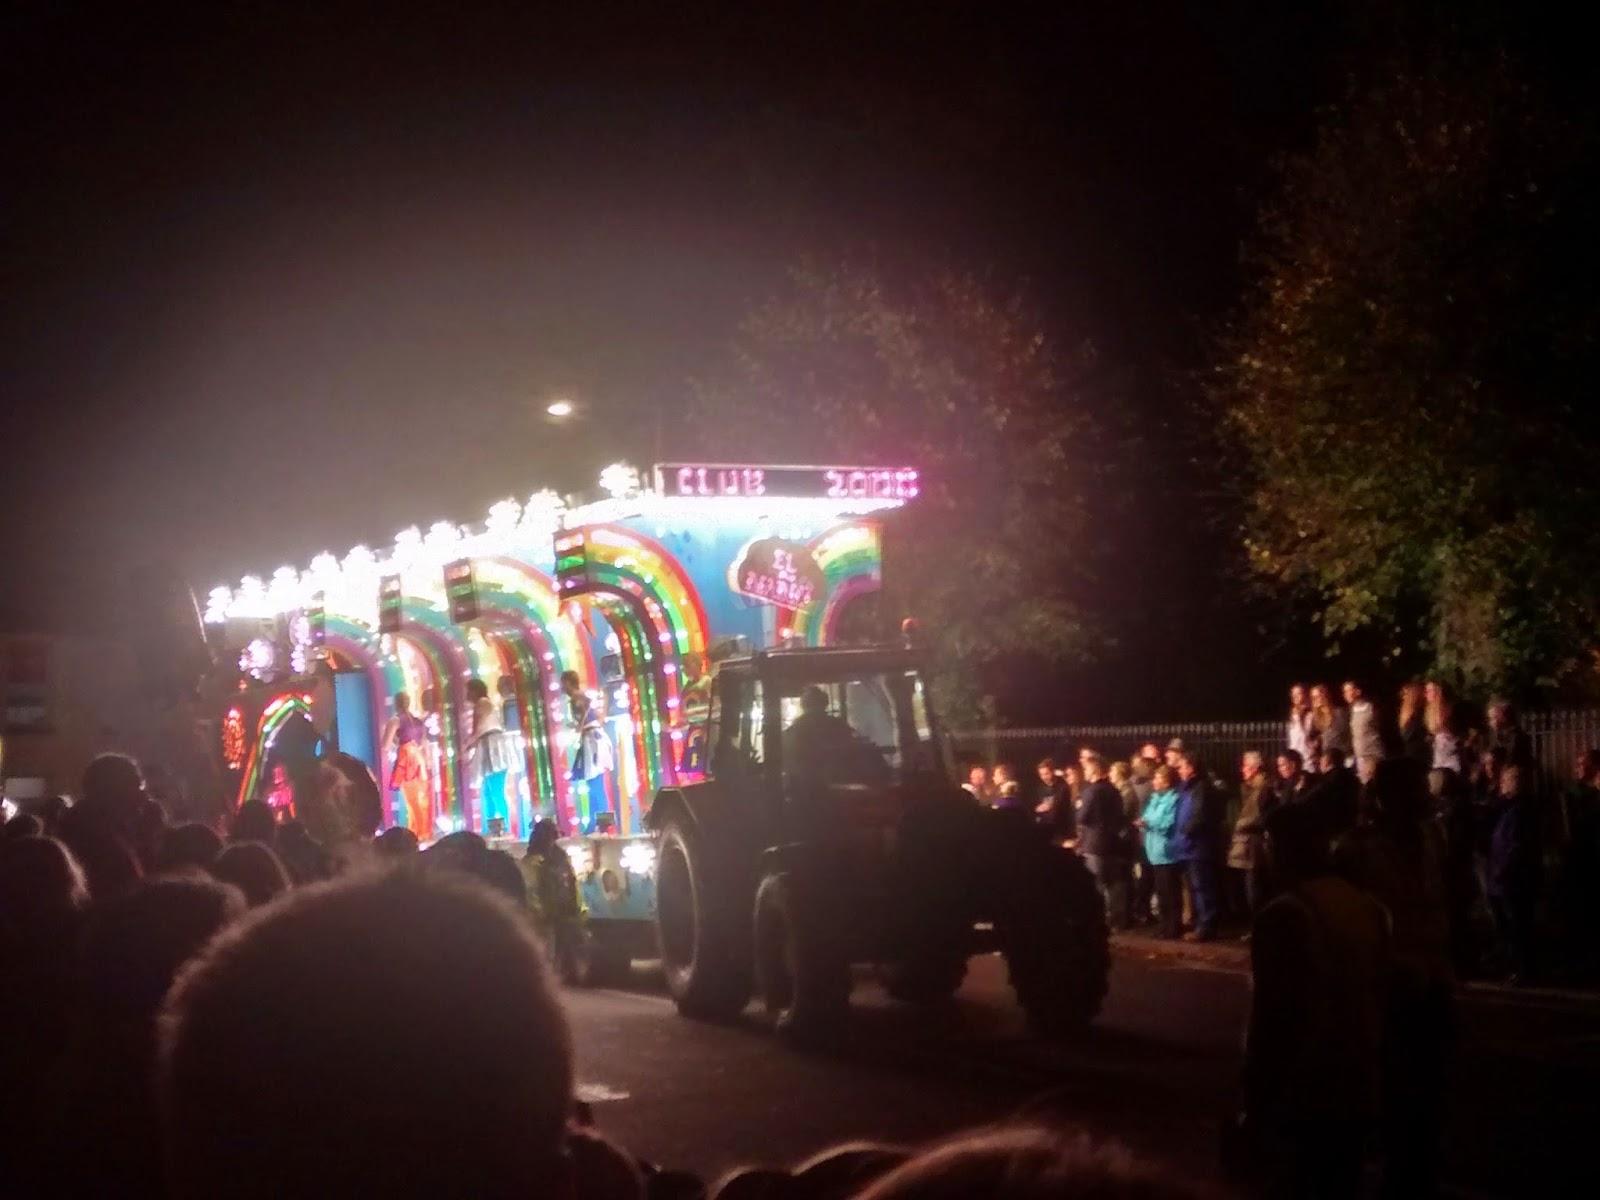 Somerset carnival 2014